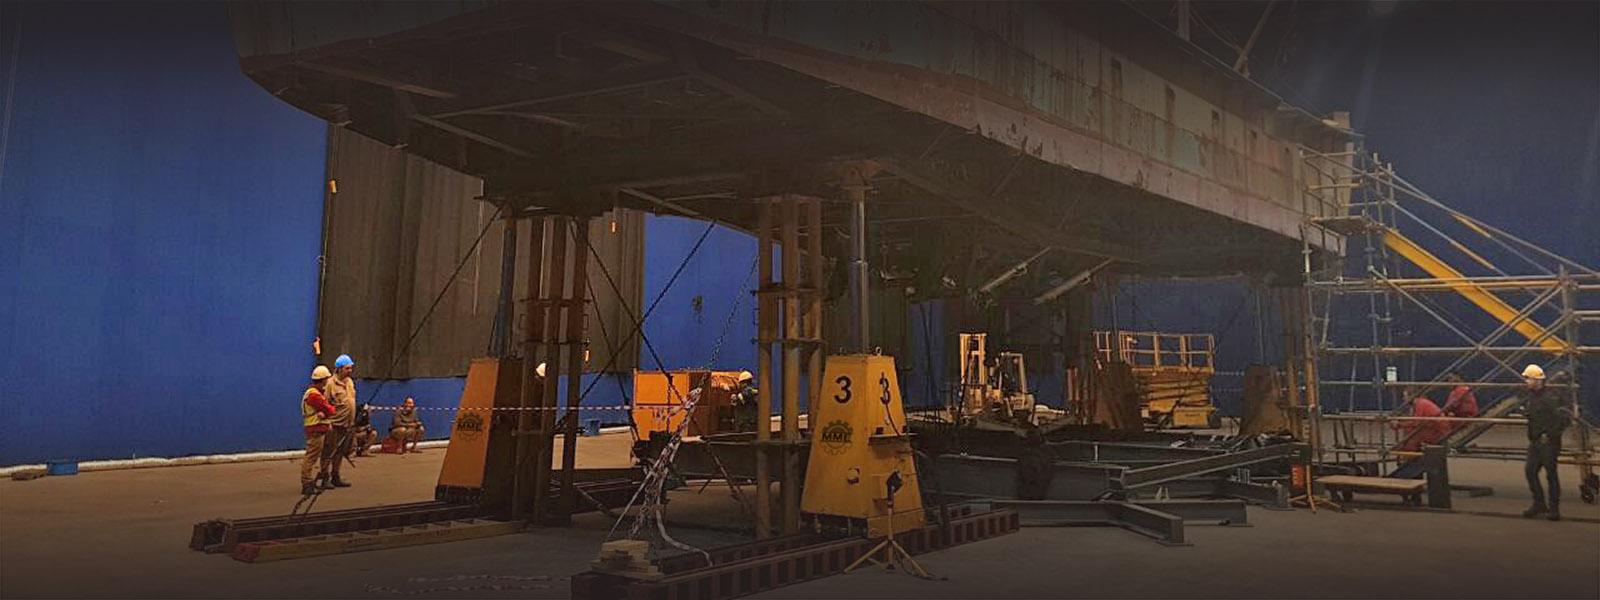 heavy-lifting-division-projects-MME-machine-moving-engineering-machinery-equipment-Gauteng-KwaZulu-Natal-ZA